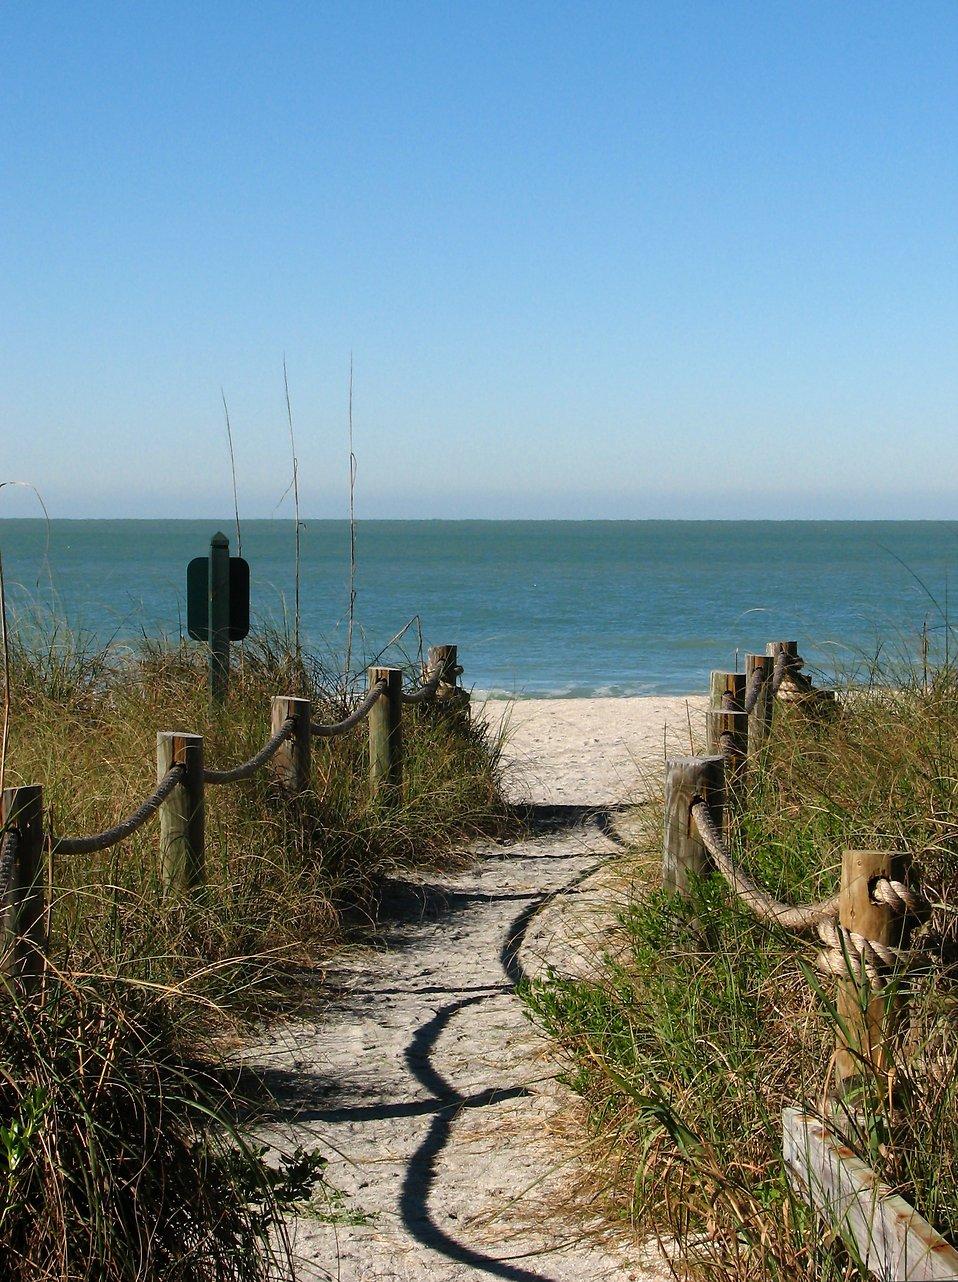 A path heading to the beach : Free Stock Photo